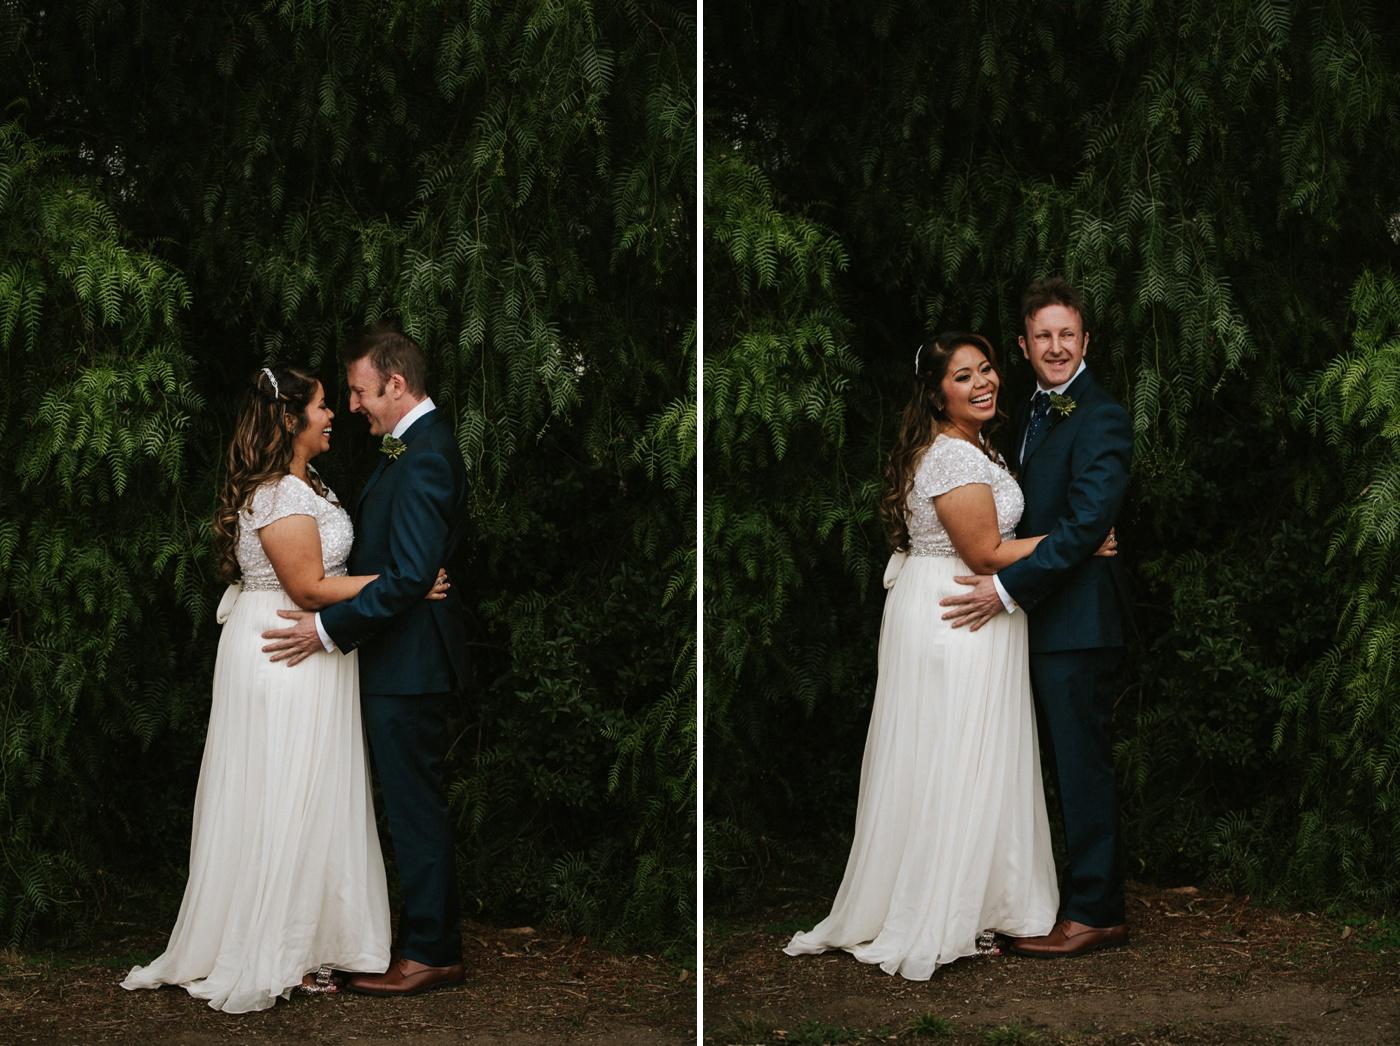 anitadaniel_melbourne-scienceworks-relaxed-fun-geek-wedding_melbourne-candid-wedding-photography_18